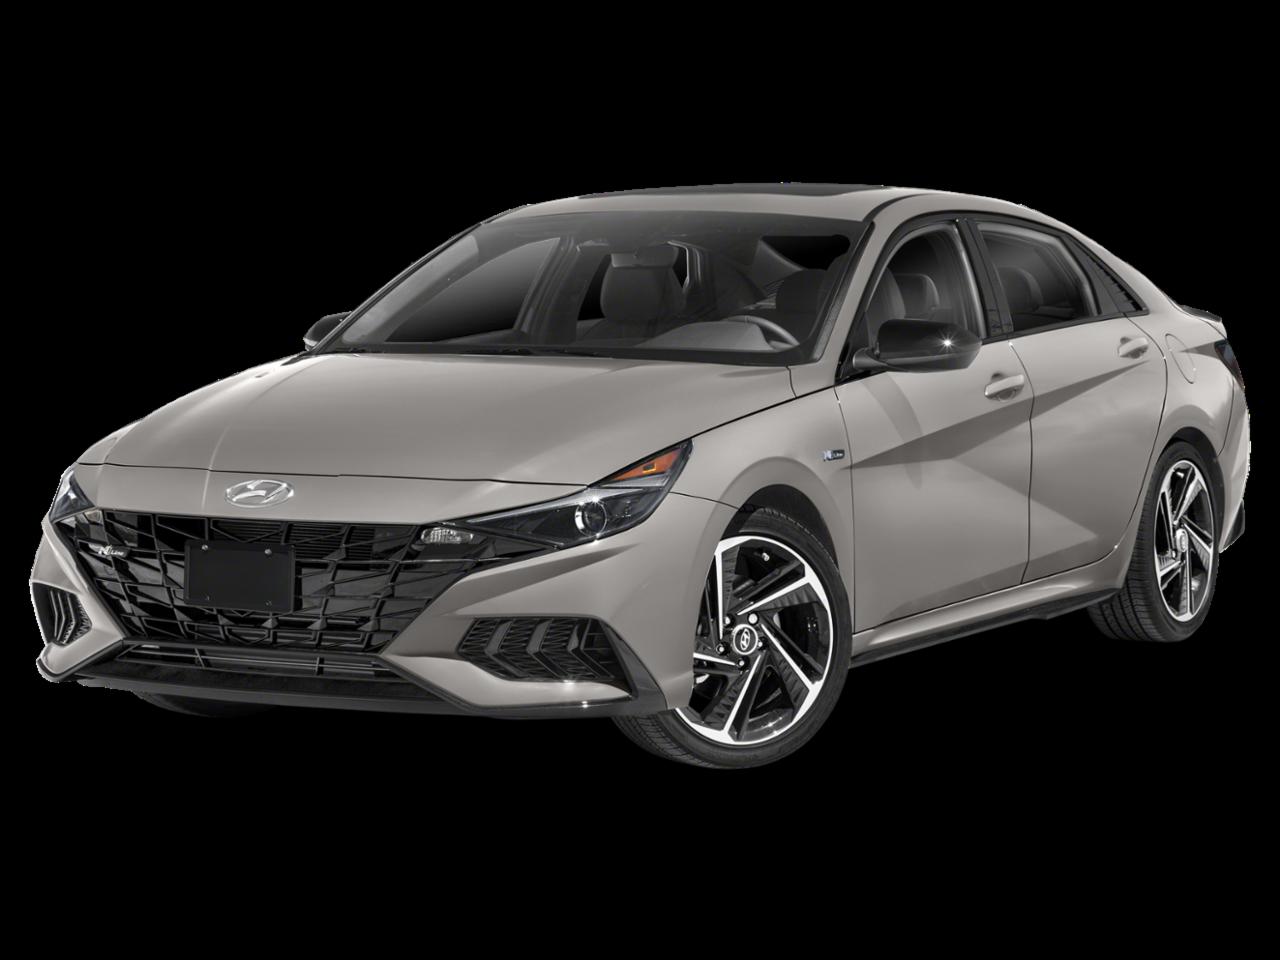 Hyundai 2022 Elantra N Line